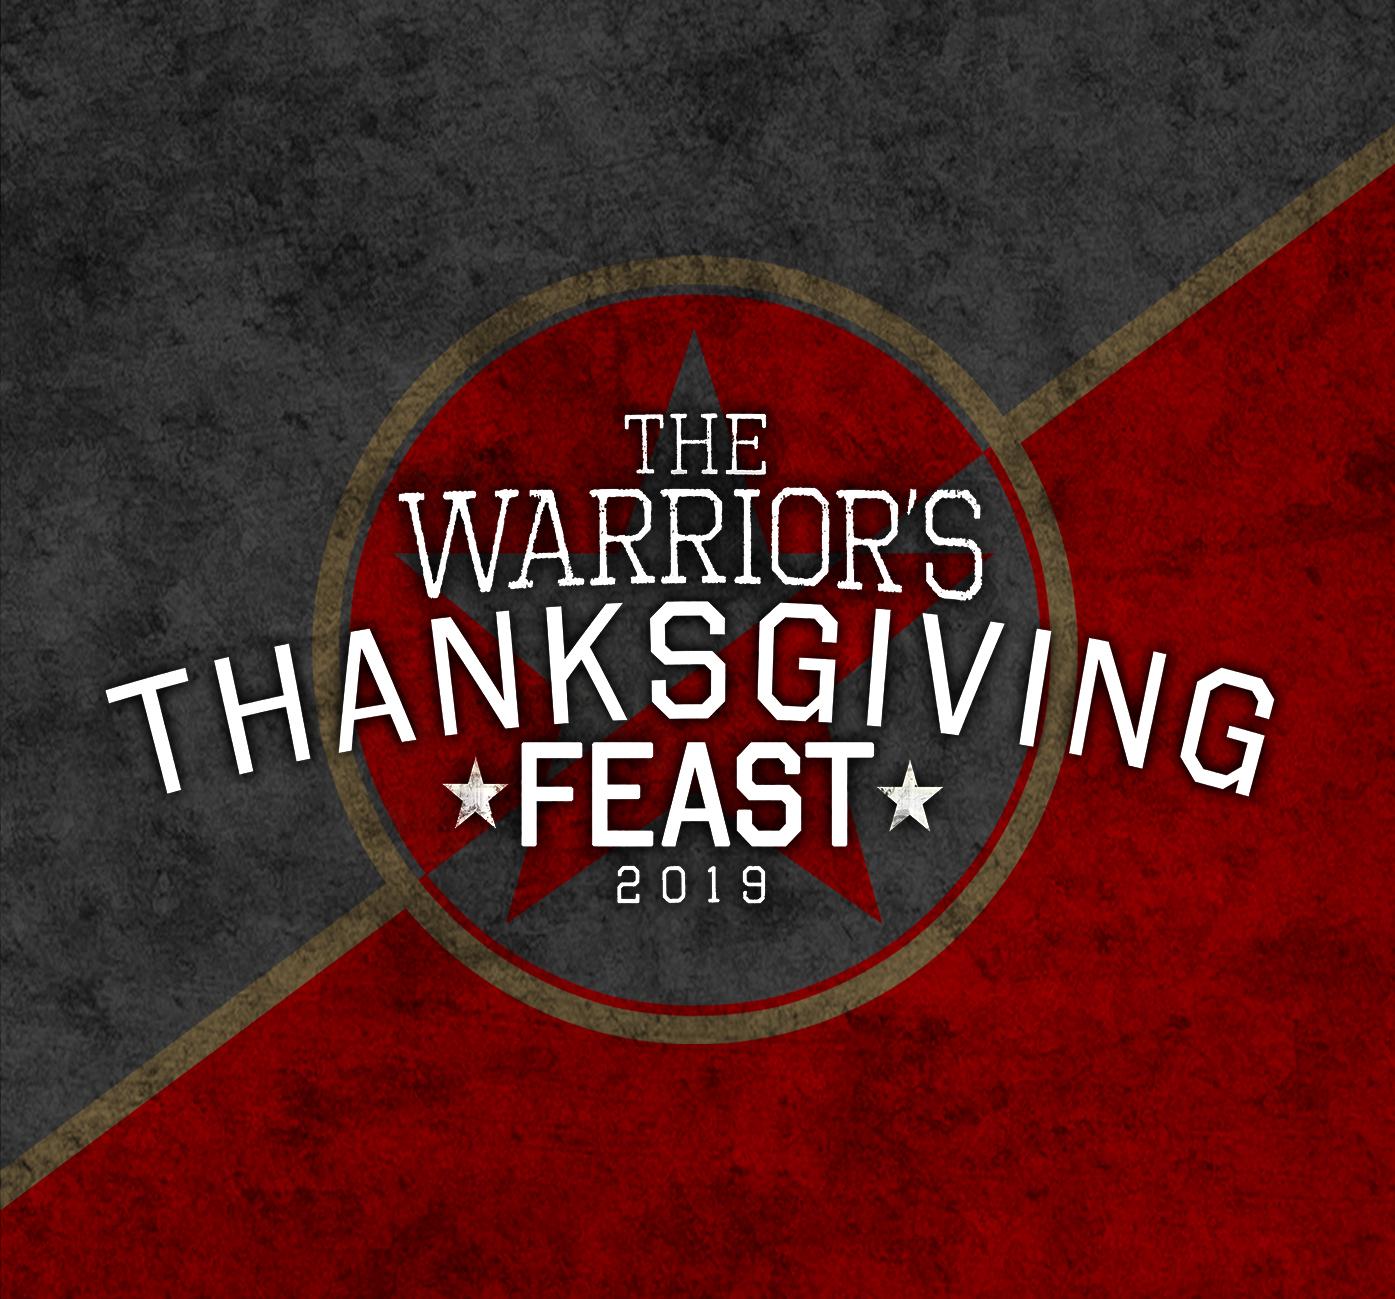 2019 feast logo